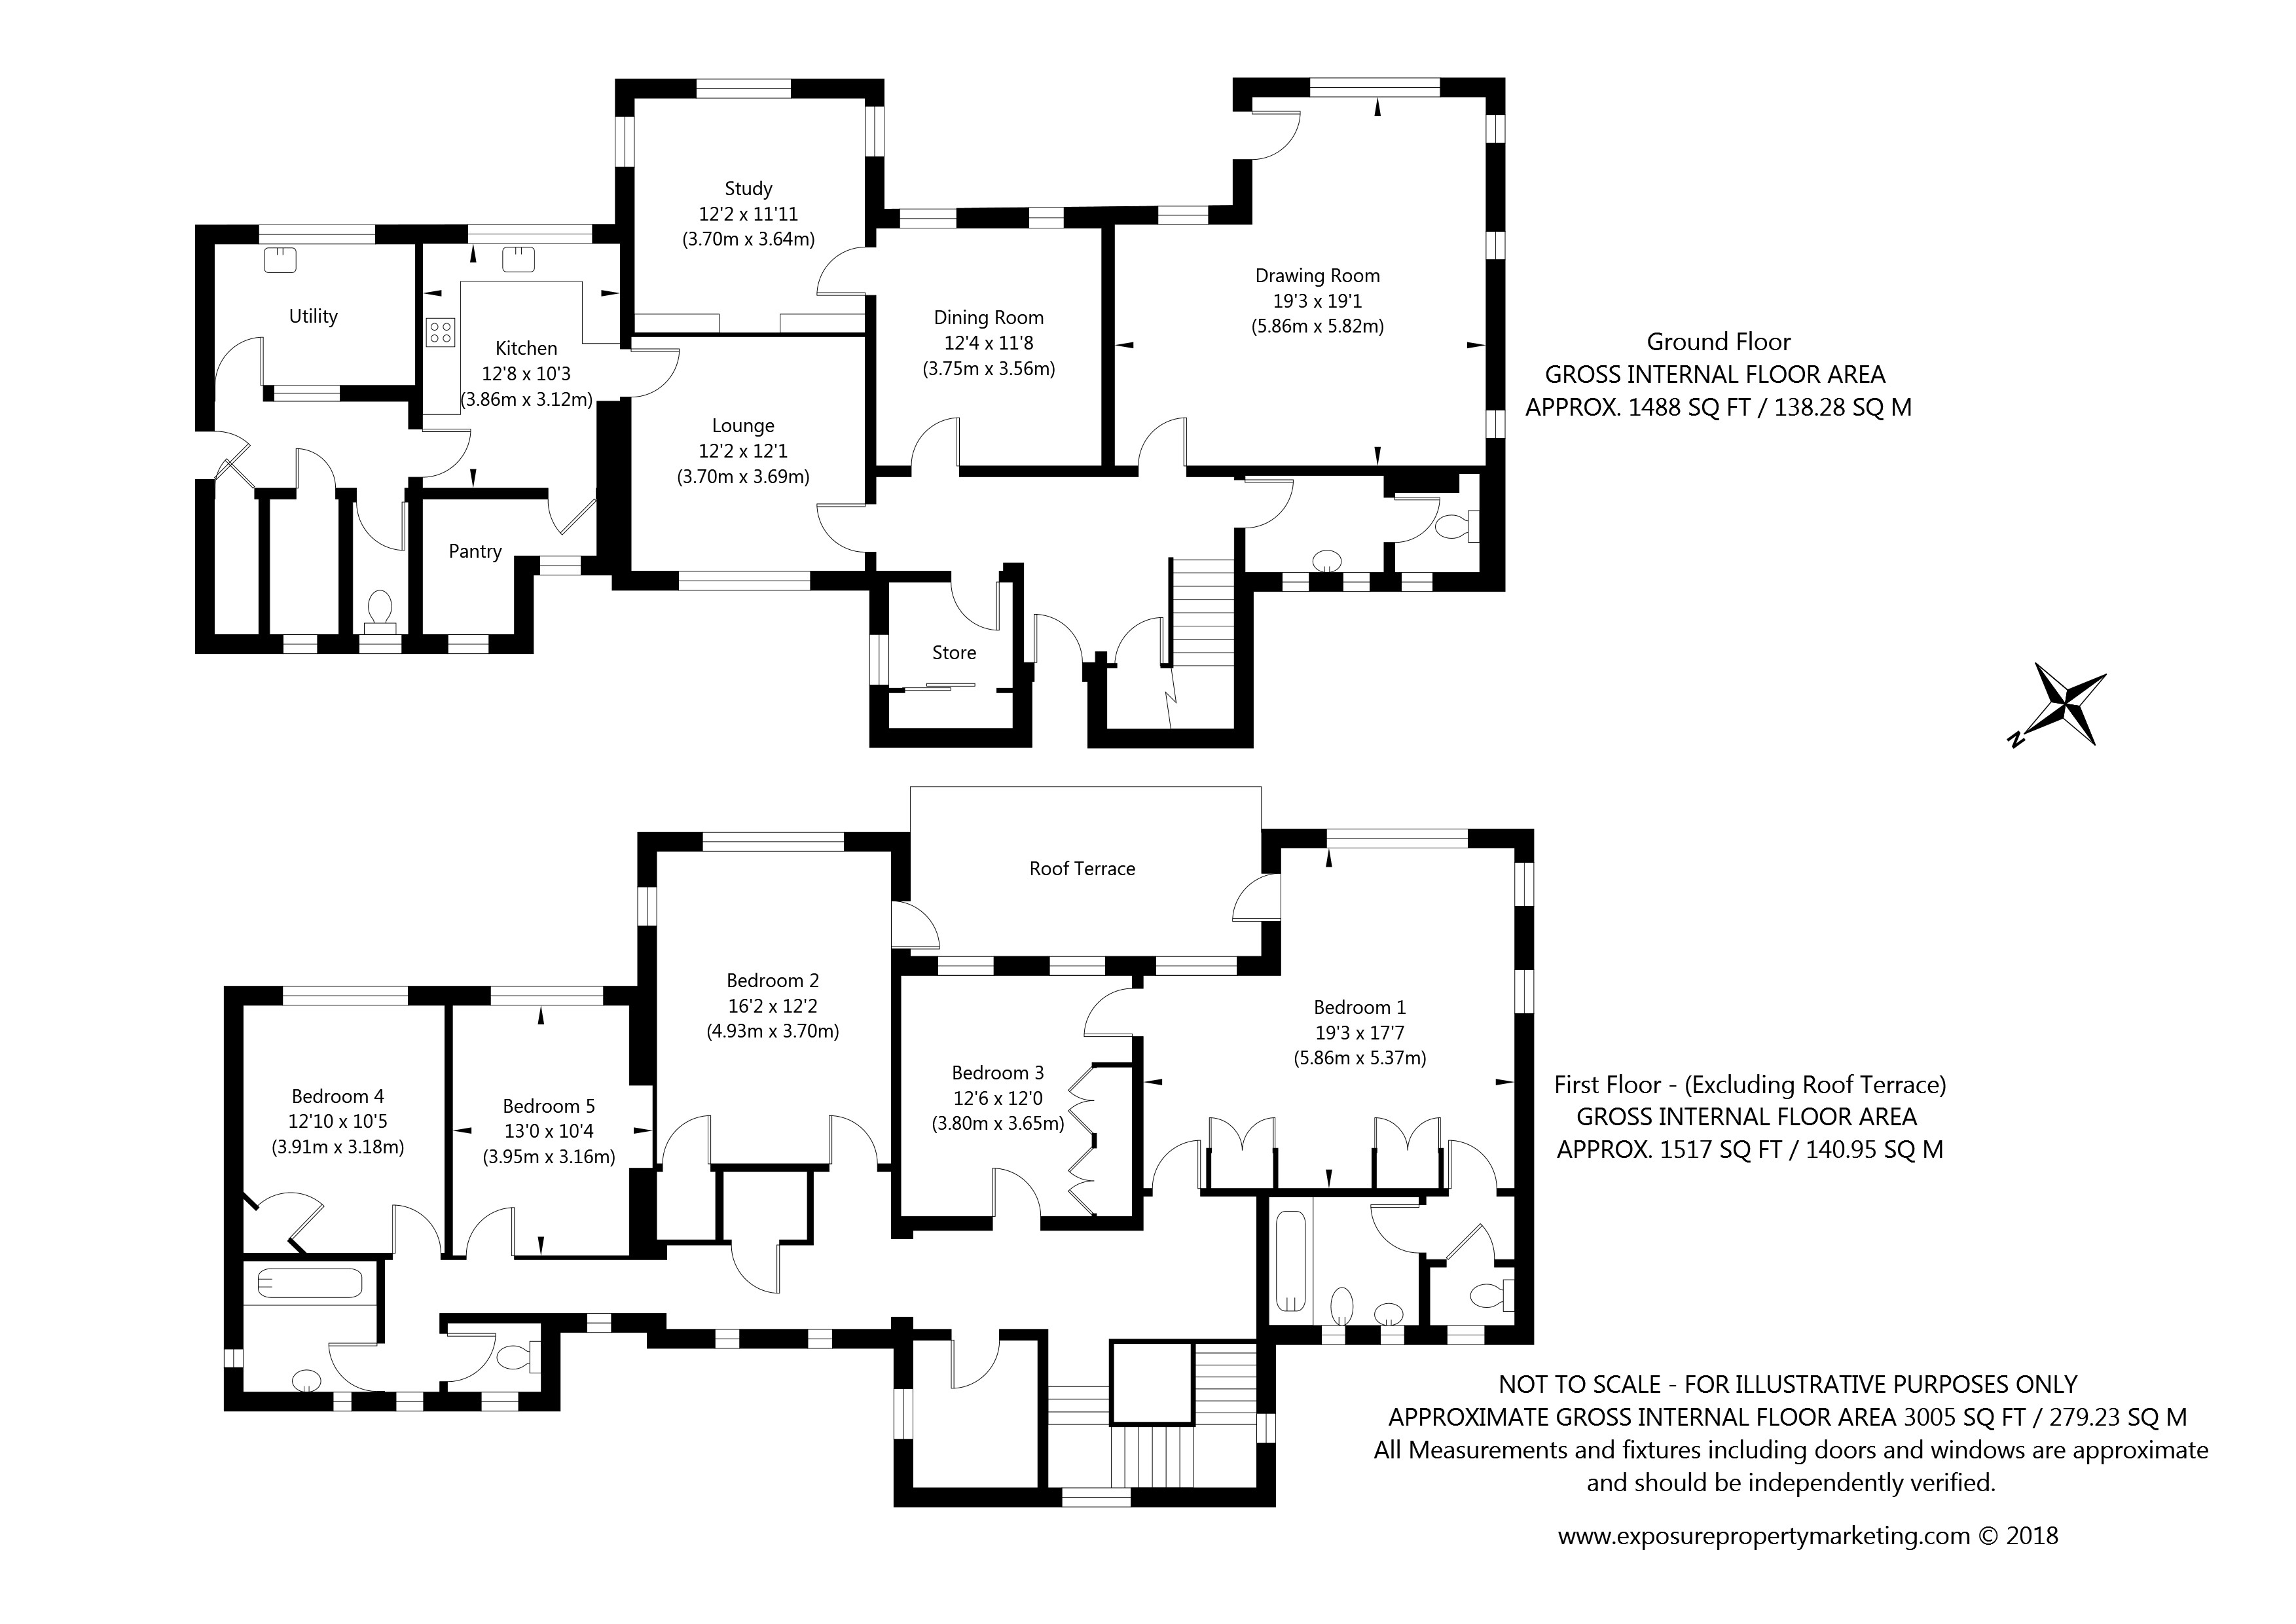 53 Hillfield House, Askham Lane, York property floorplan